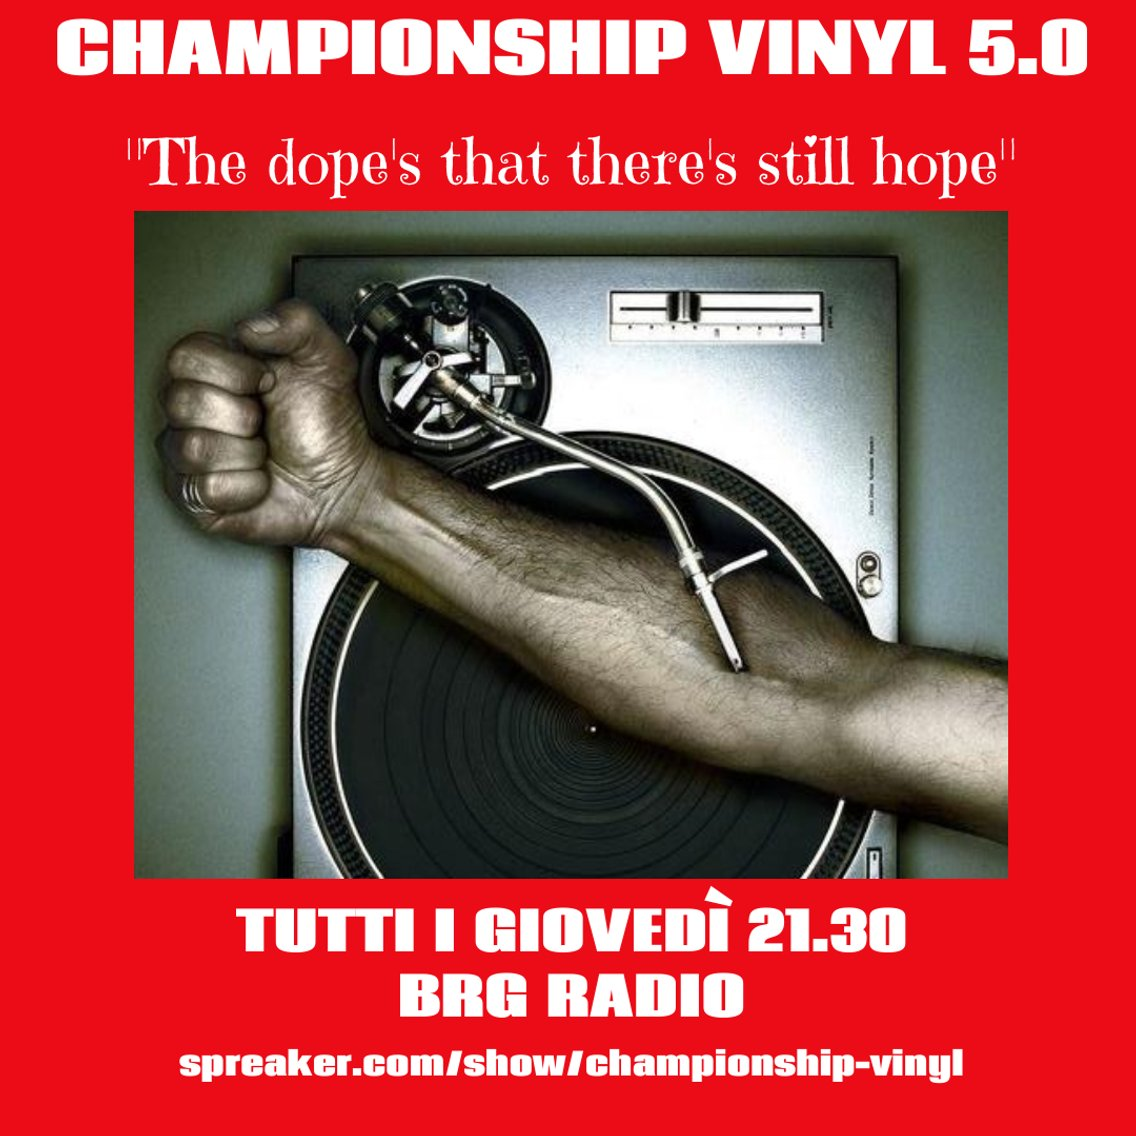 Championship Vinyl - immagine di copertina